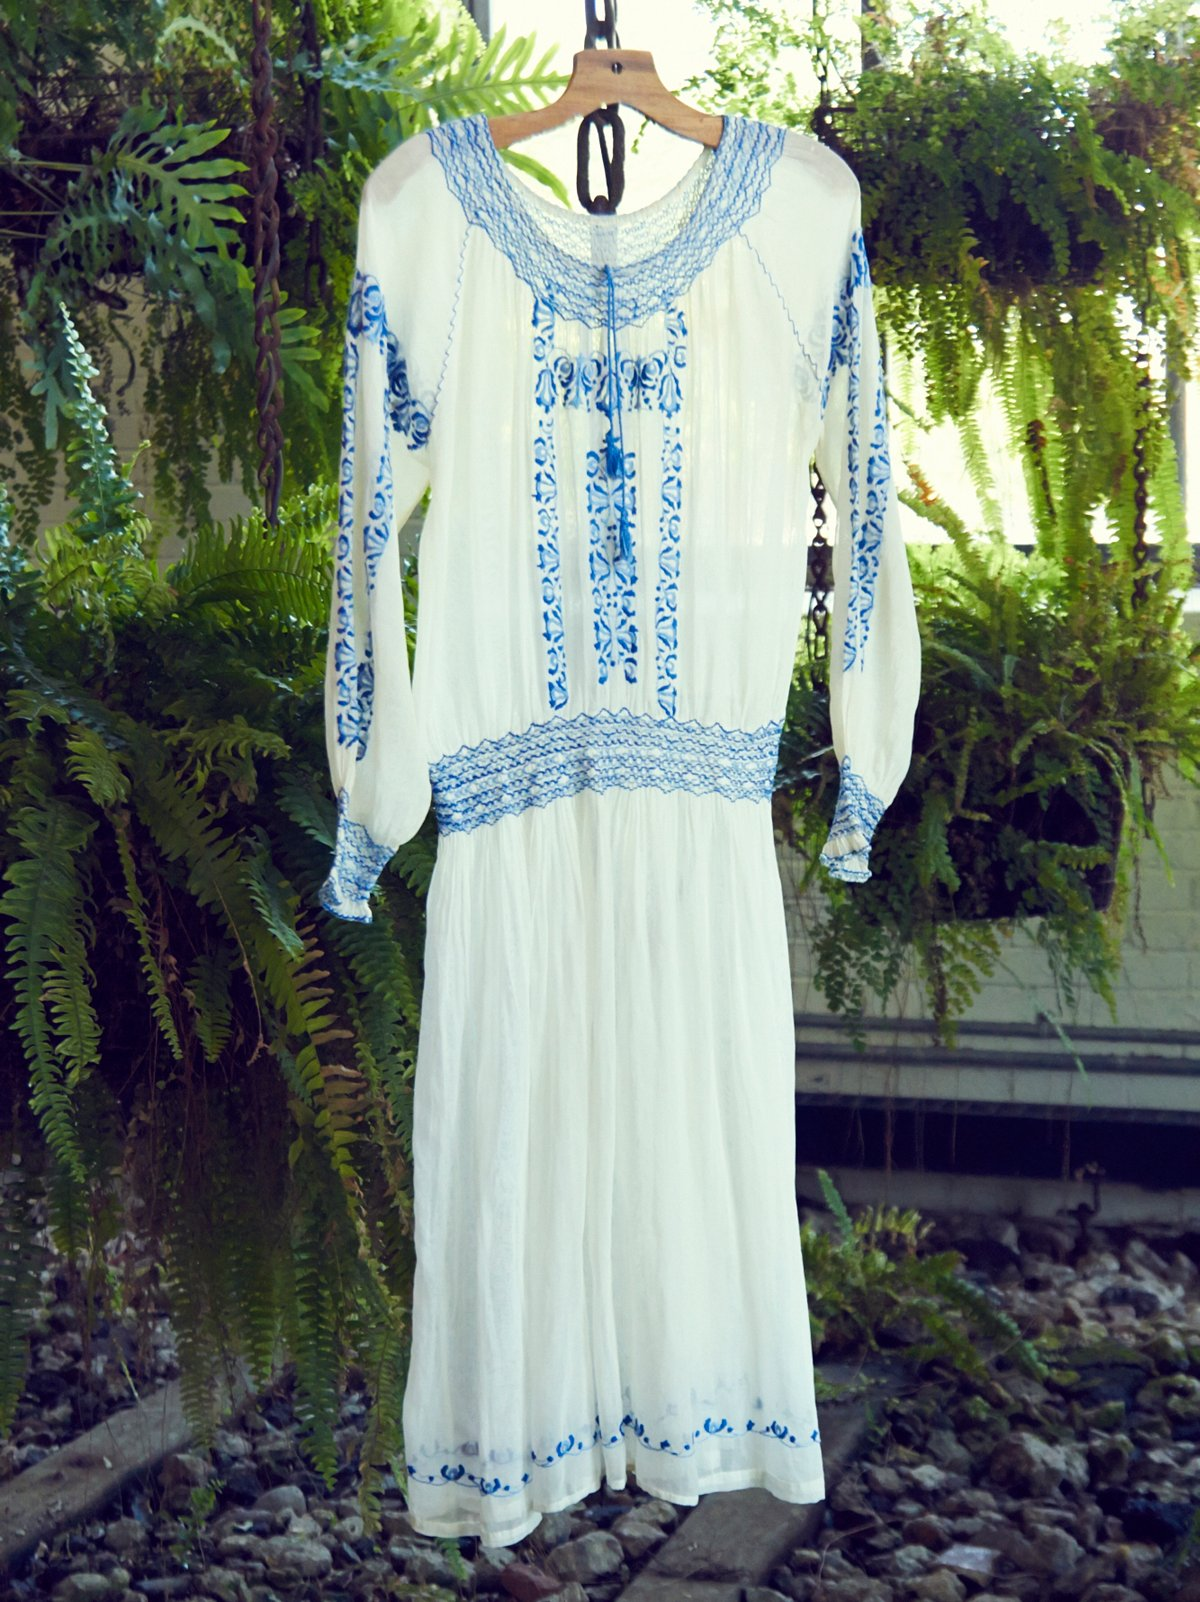 Vintage 1940s Peasant Dress